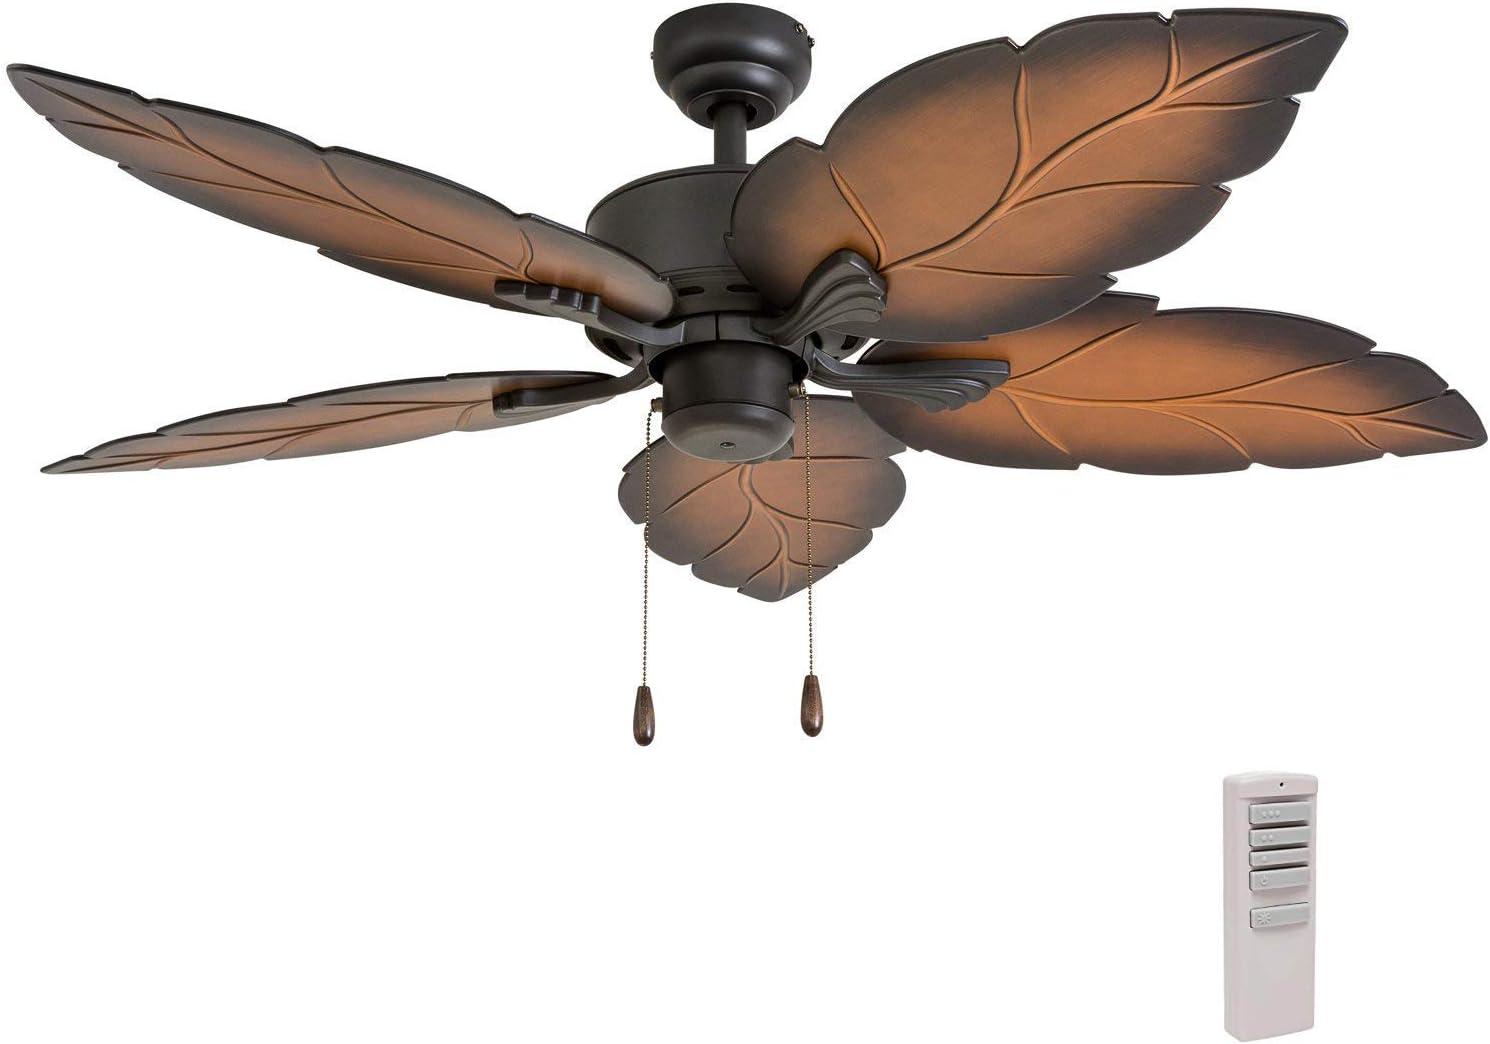 Prominence Home 50688-01 Beauxregard Tropical Ceiling Fan 3 Speed Remote 52 , Mocha, Bronze